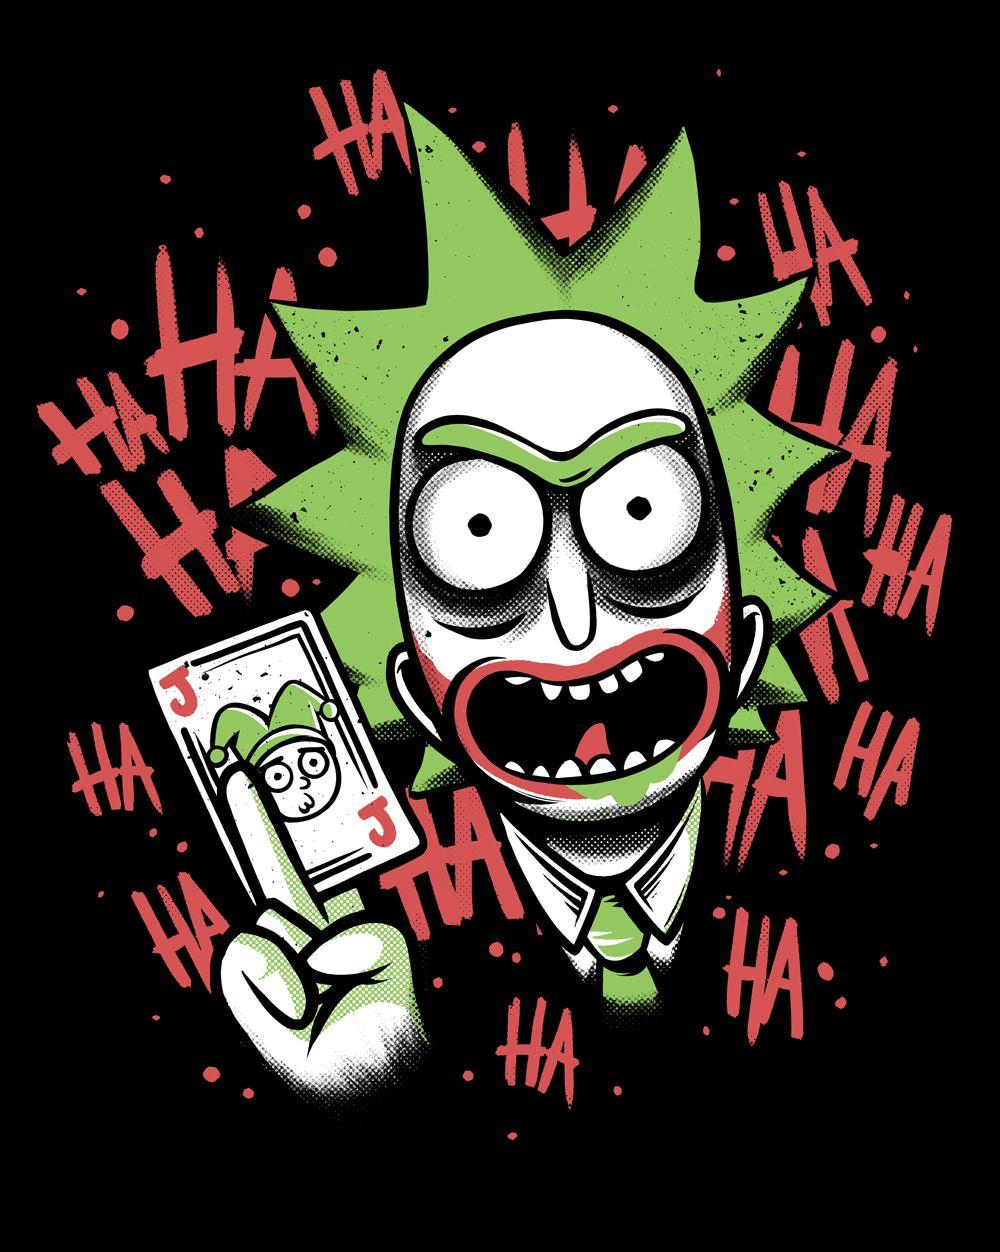 48a2dbf20 it and morty illustration. Camiseta Joker Rick - Masculina